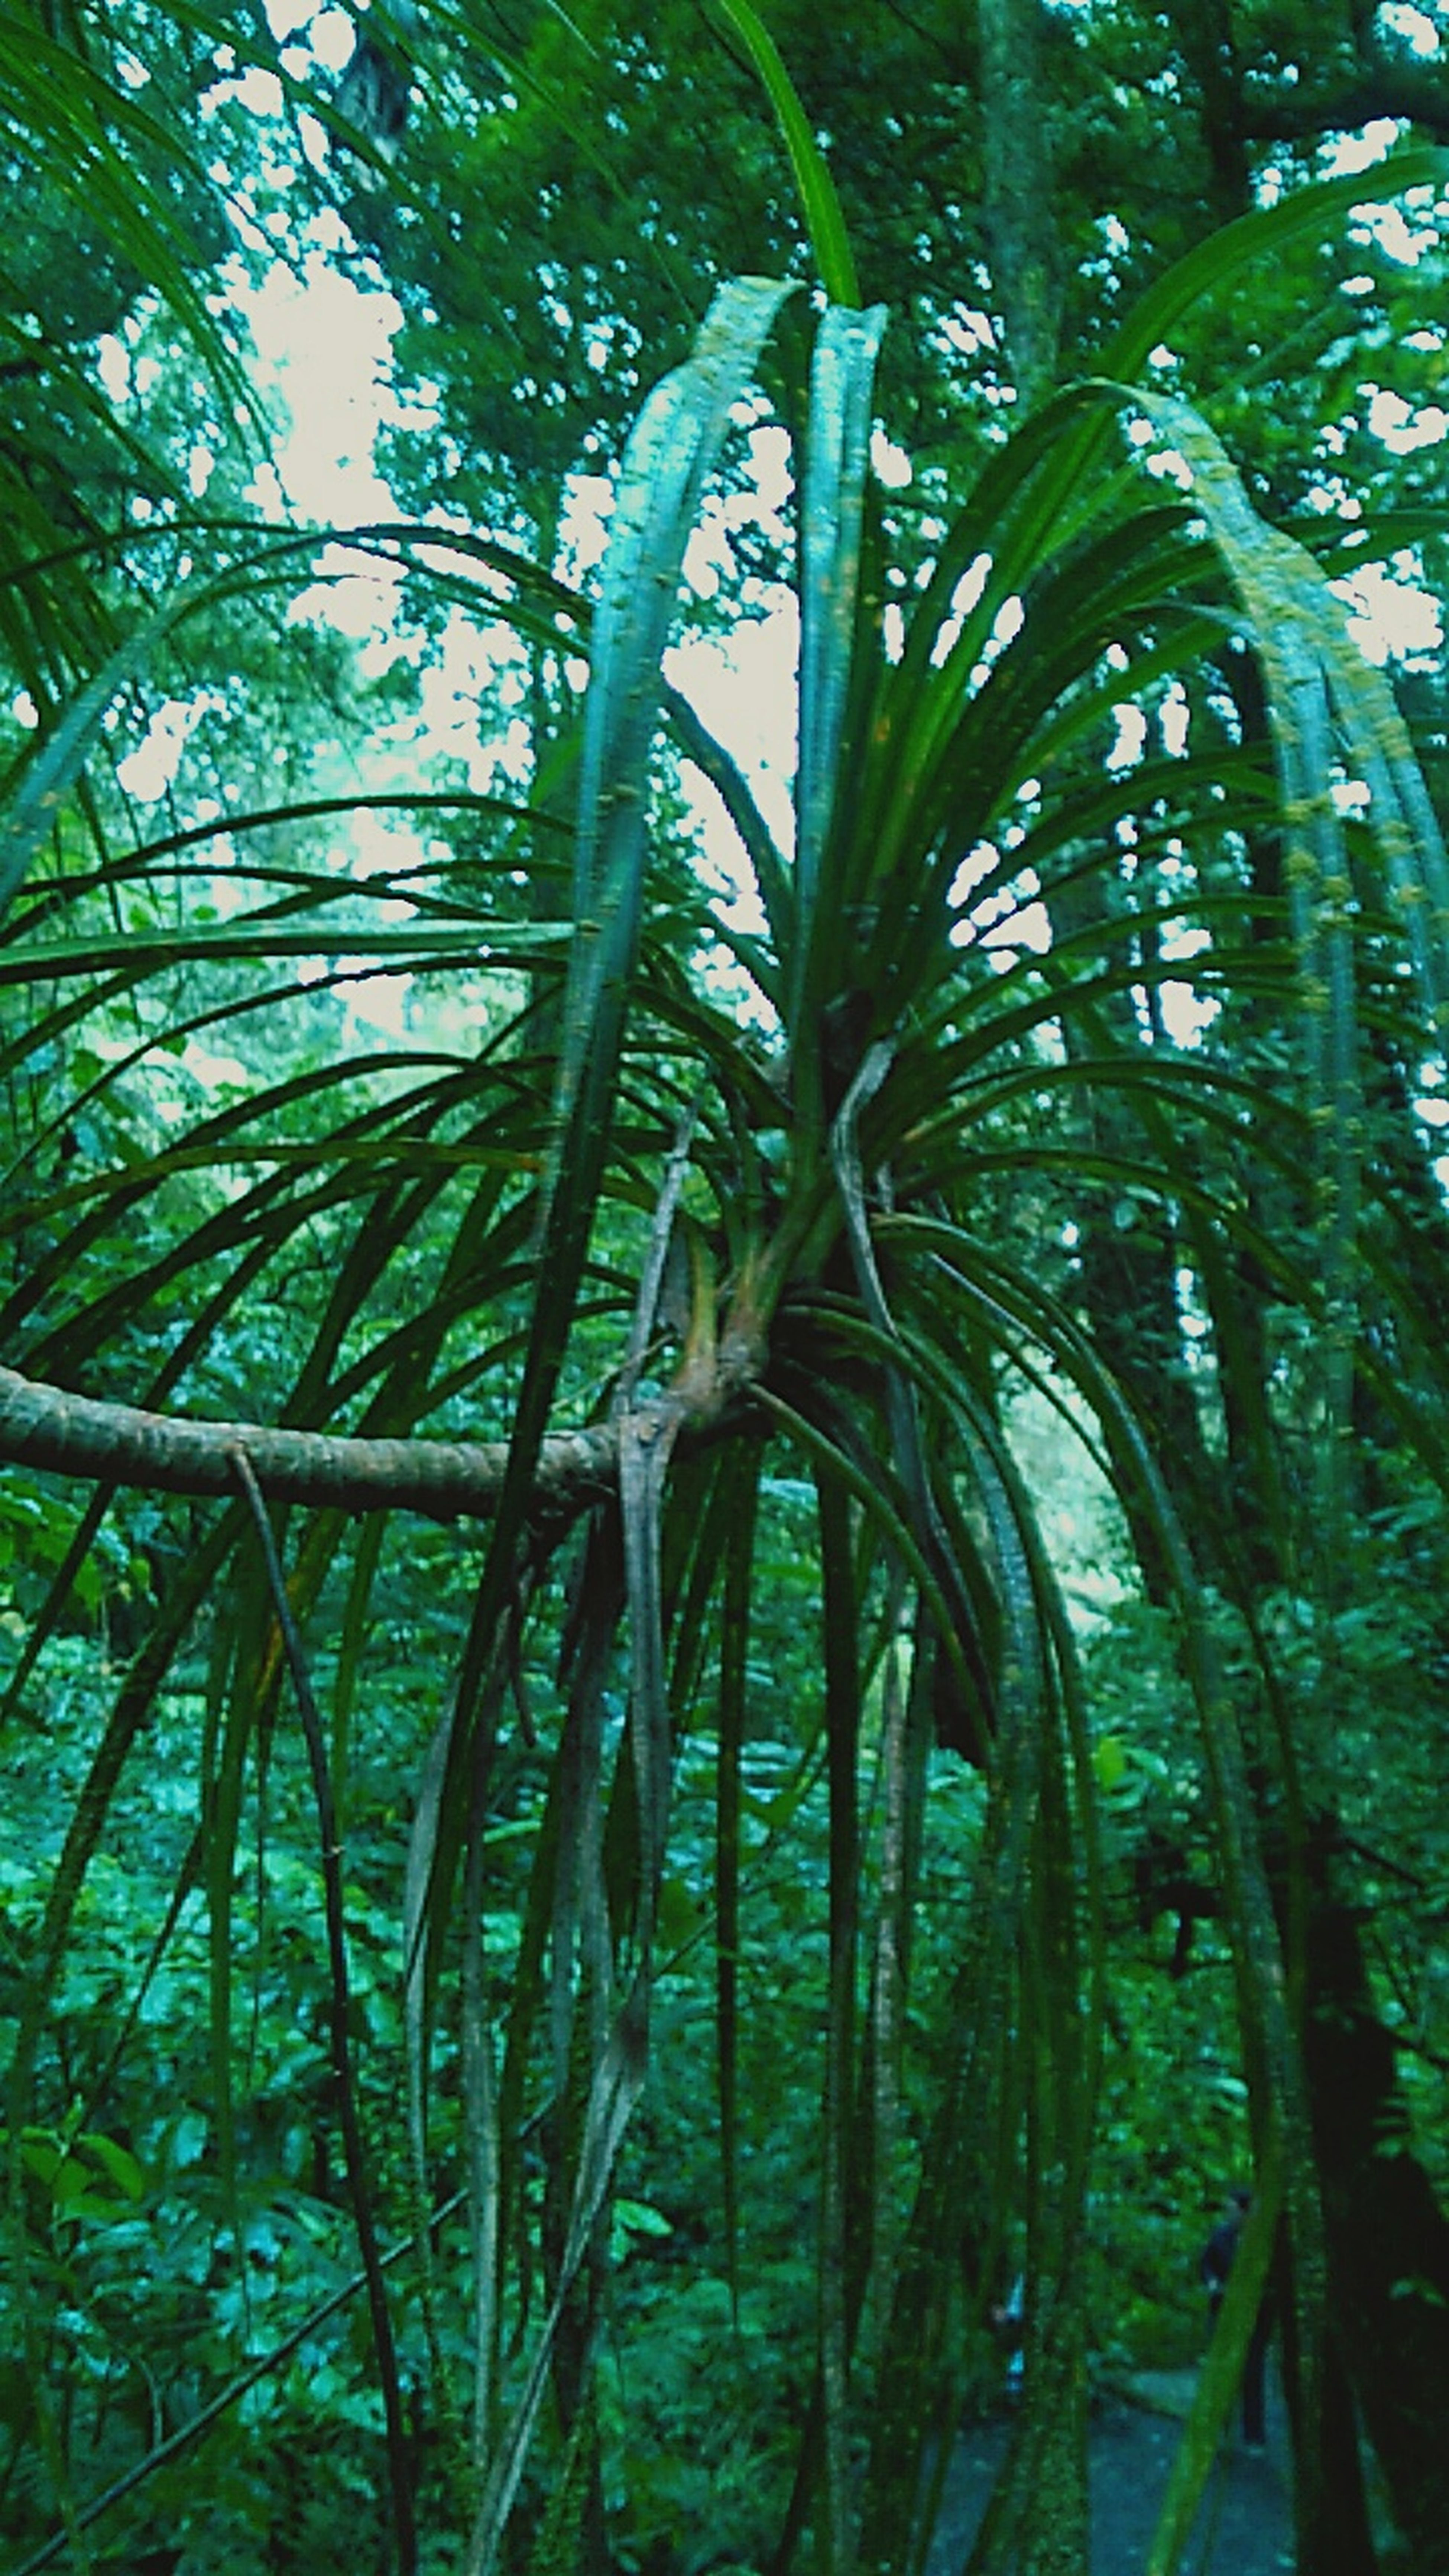 Natute walk Natureporn EyeEm Nature Lover Nature Trees Peace Walkimg Lleaves Forest Naturephotography Mobilephotography